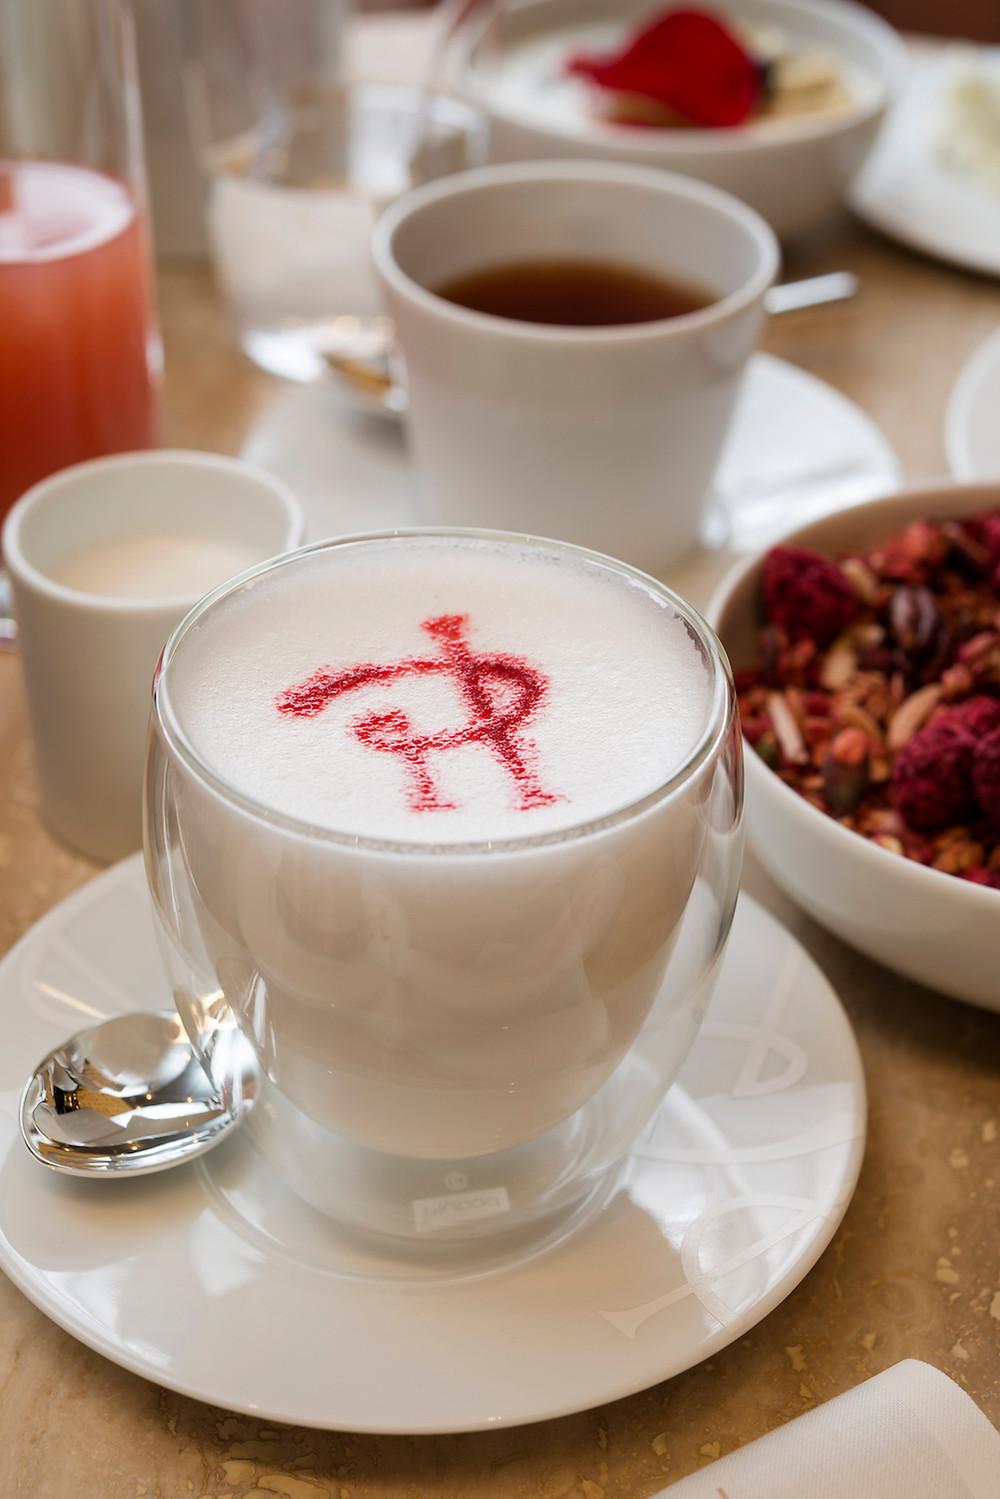 Café Pierre Hermé